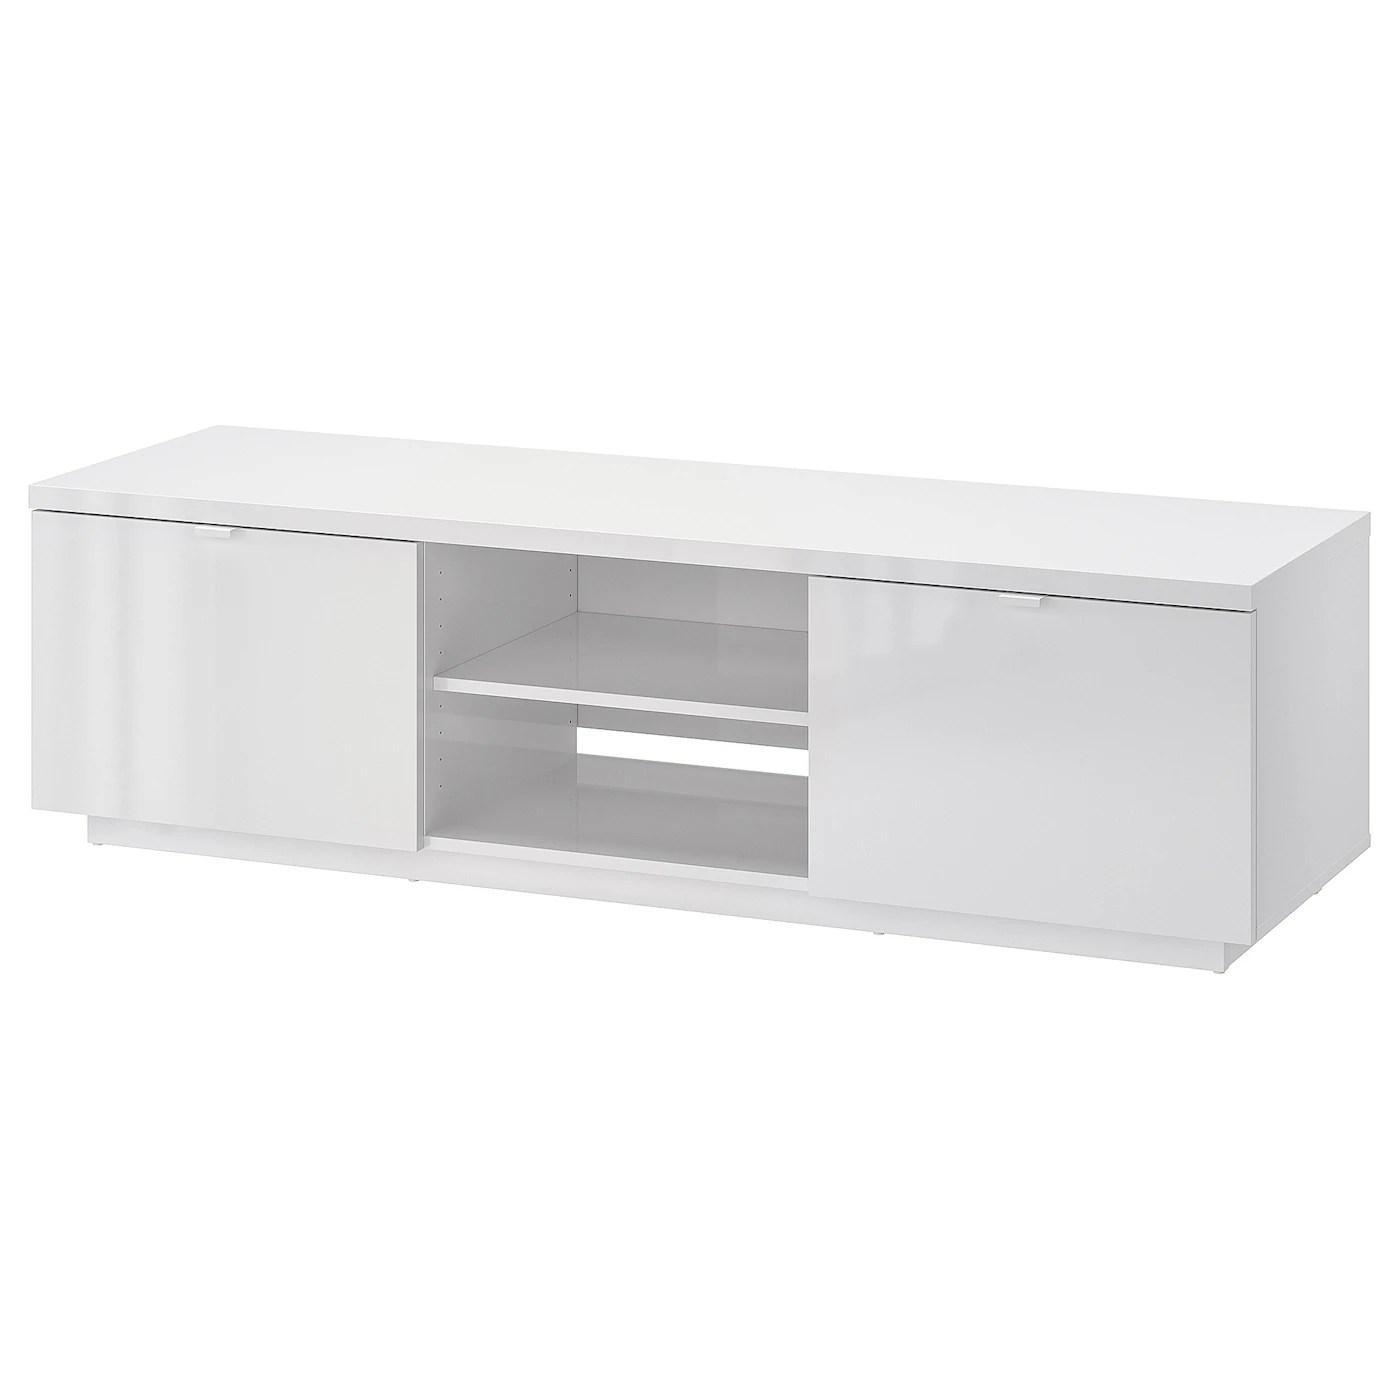 byas banc tv brillant blanc 160x42x45 cm